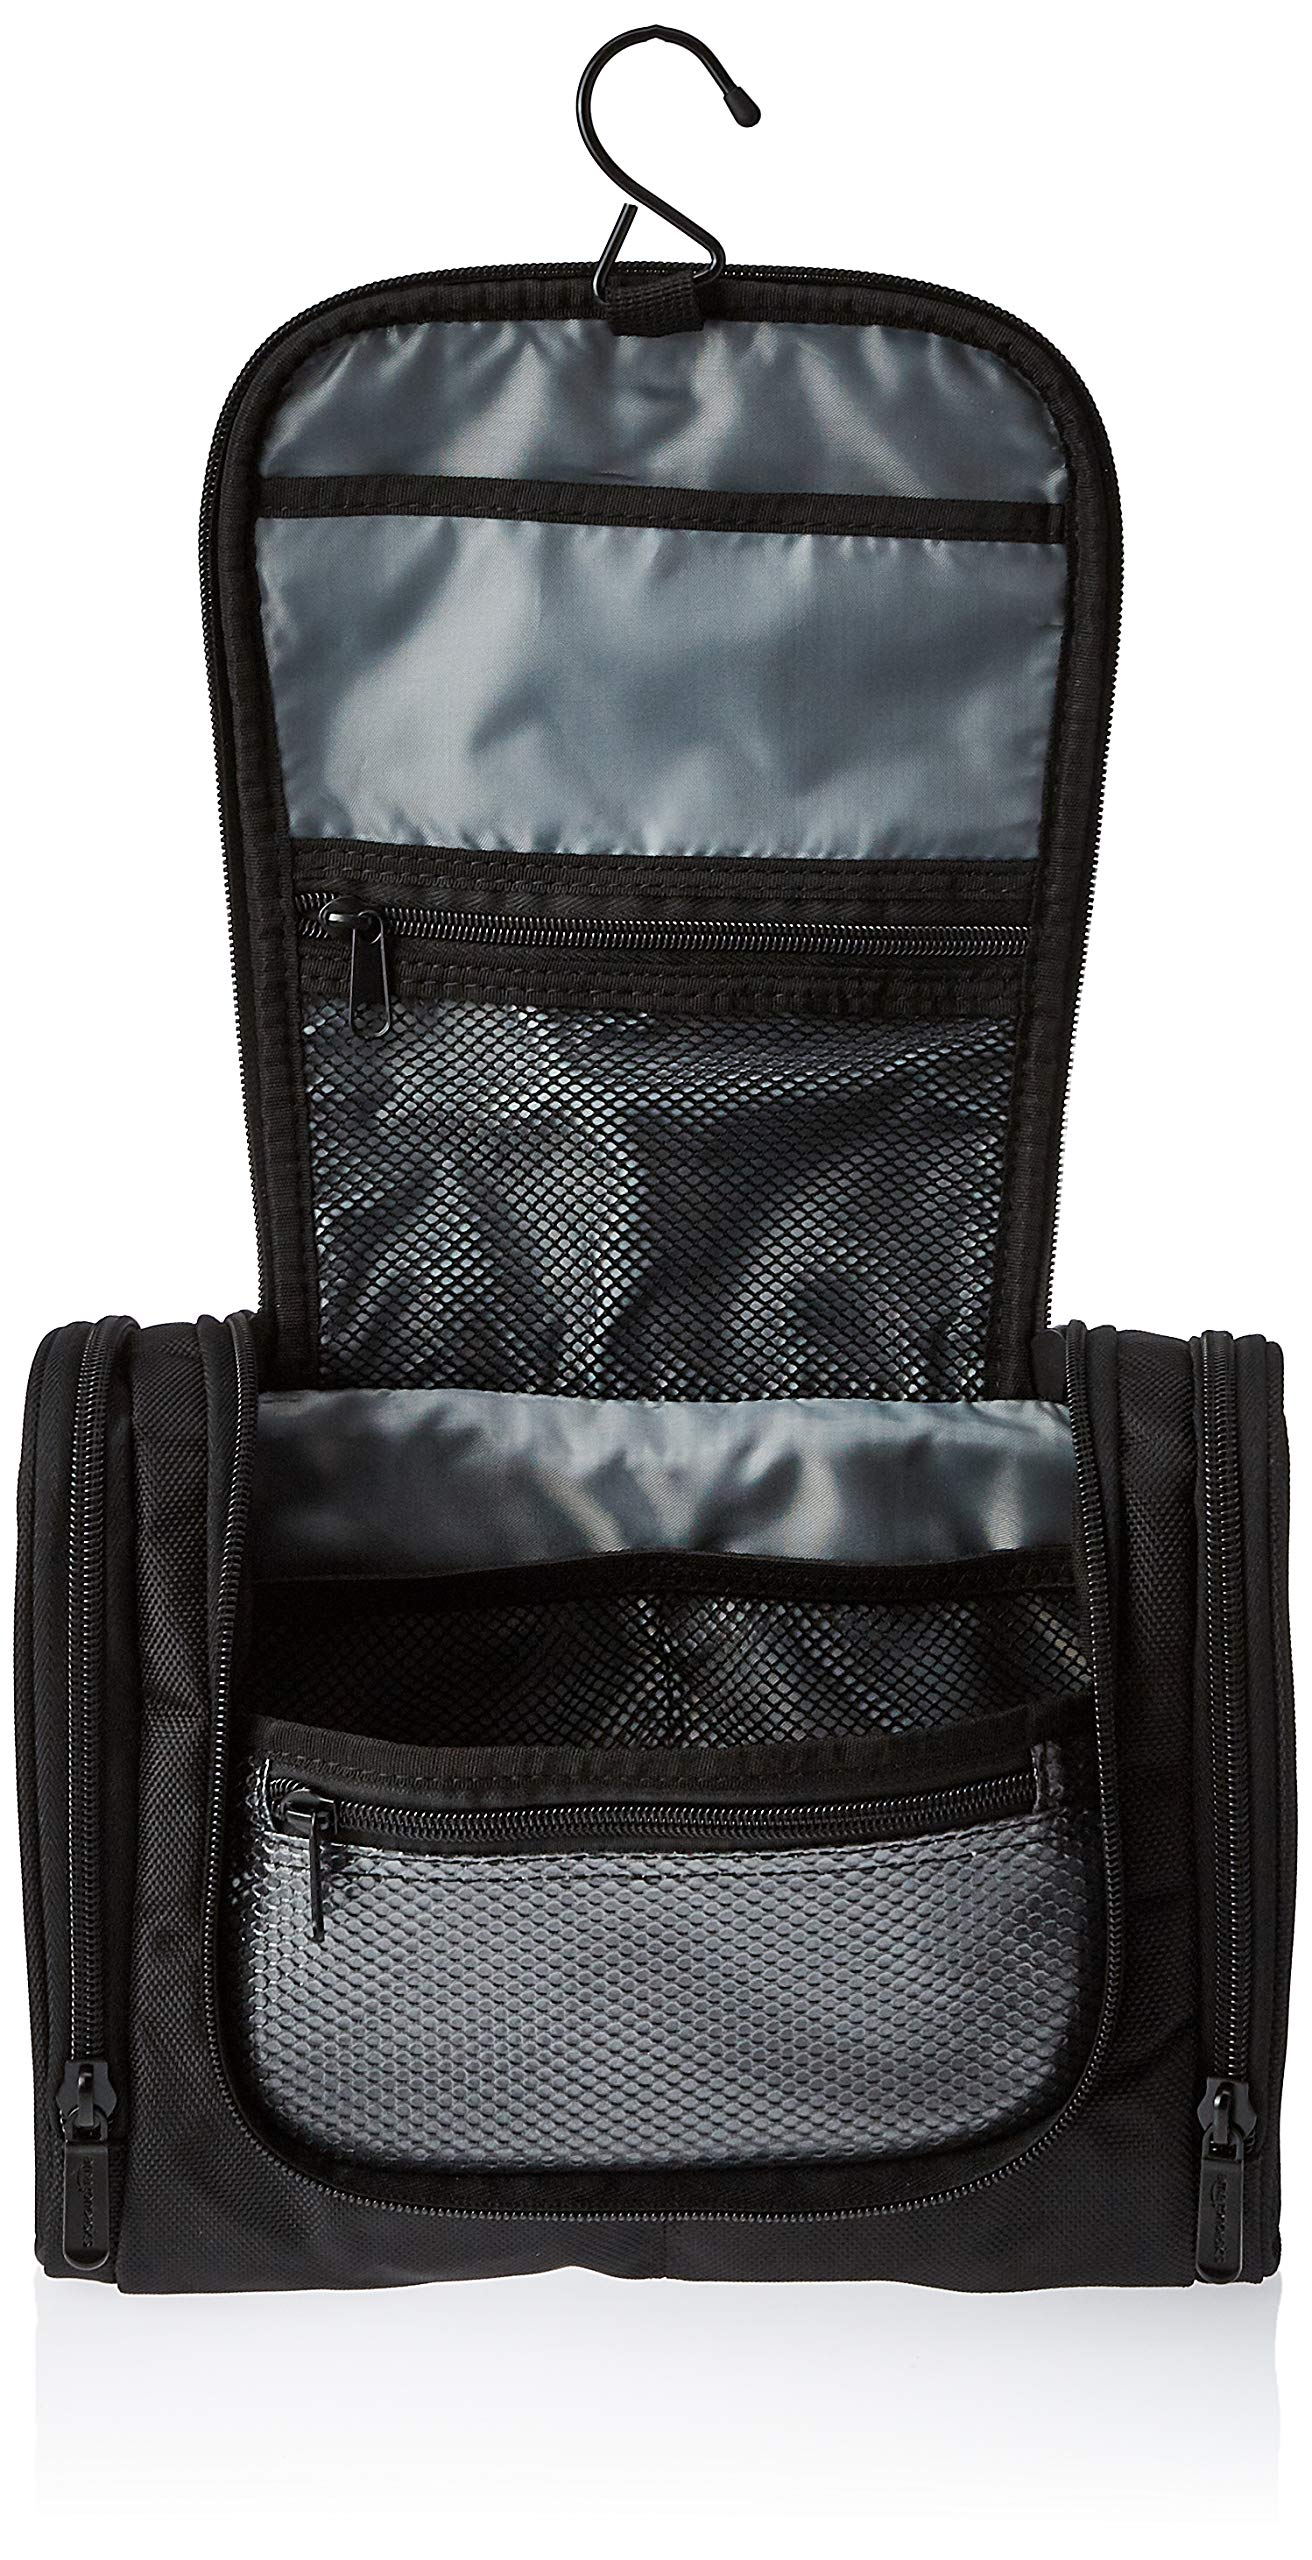 Amazon Basics Hanging, Travel Toiletry Bag Organizer, Shower Dopp Kit, Black